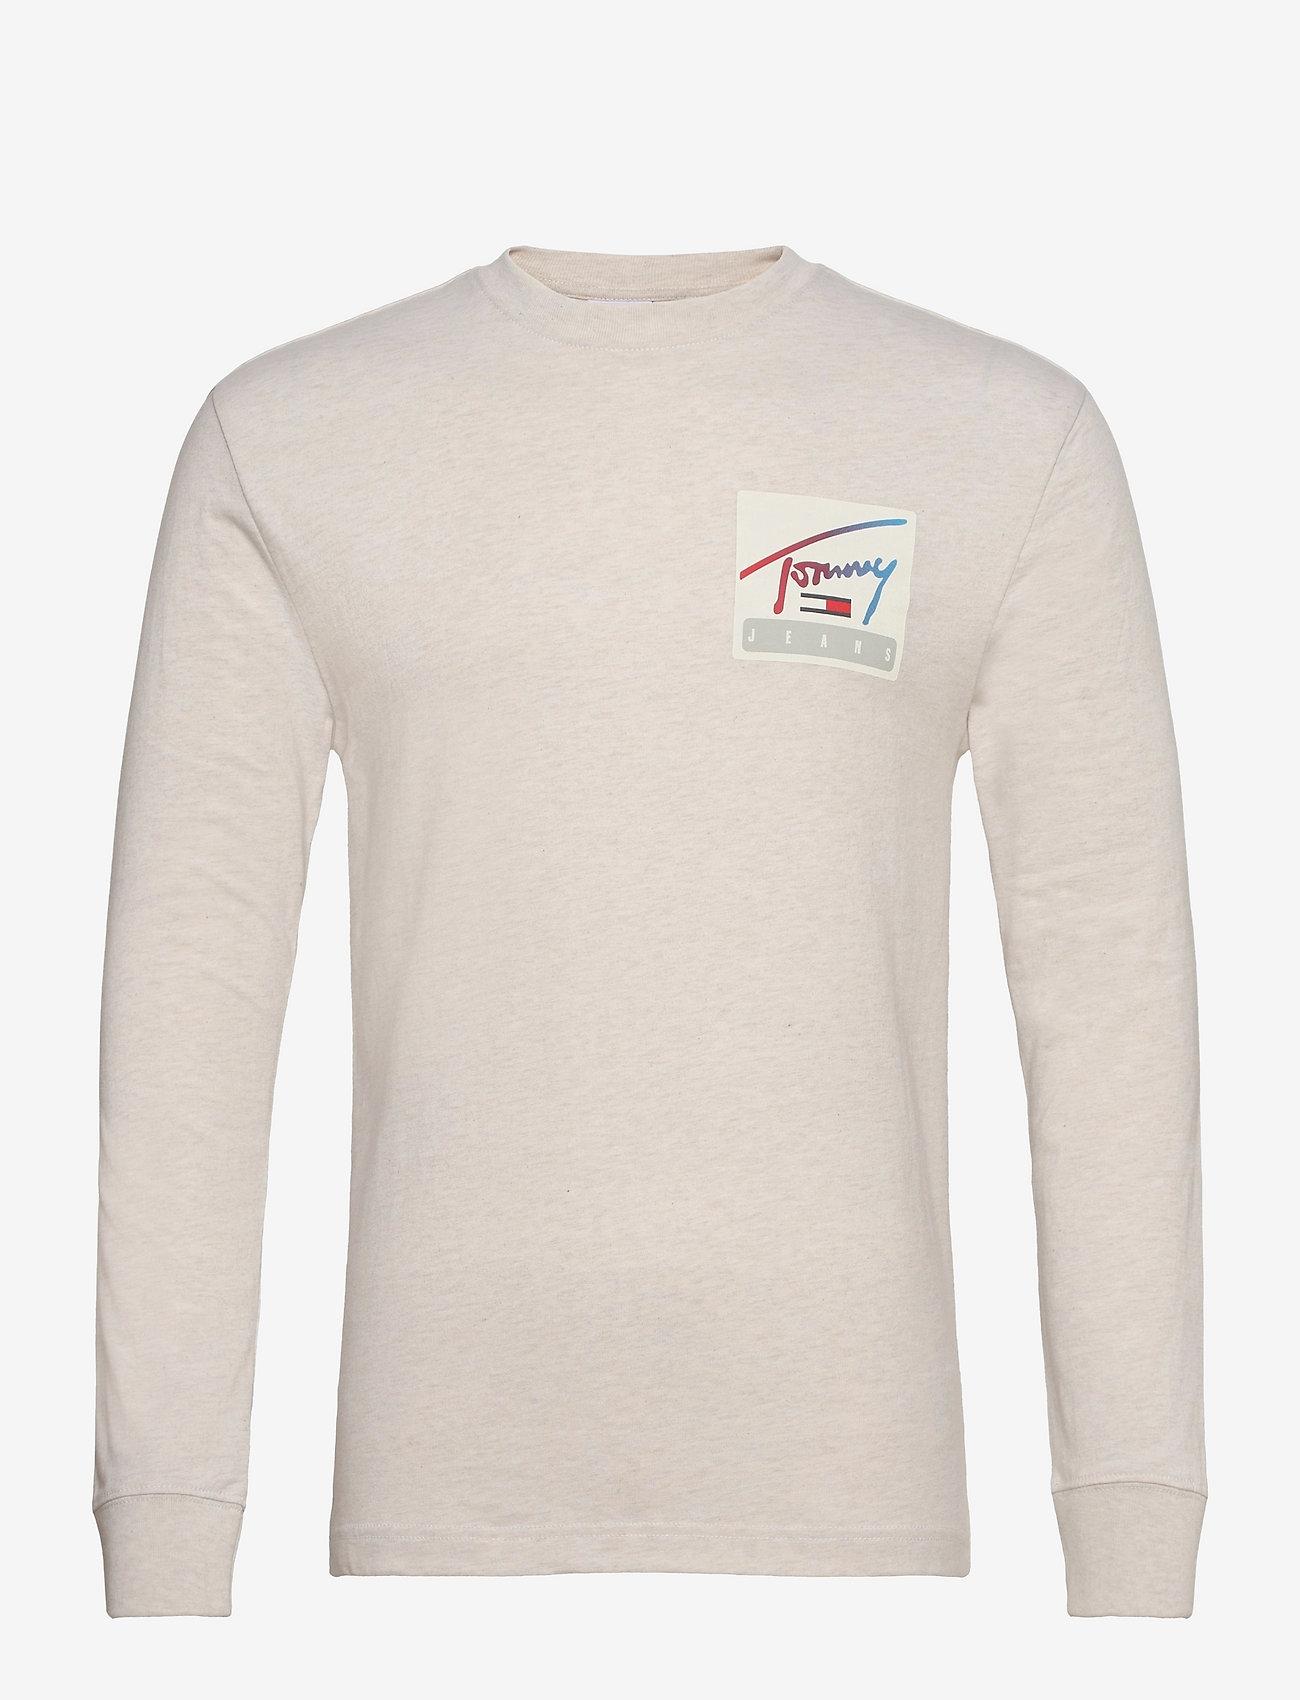 Tommy Jeans - TJM TOMMY BASKETBALL LONGSLEEVE - basic t-shirts - white - 0